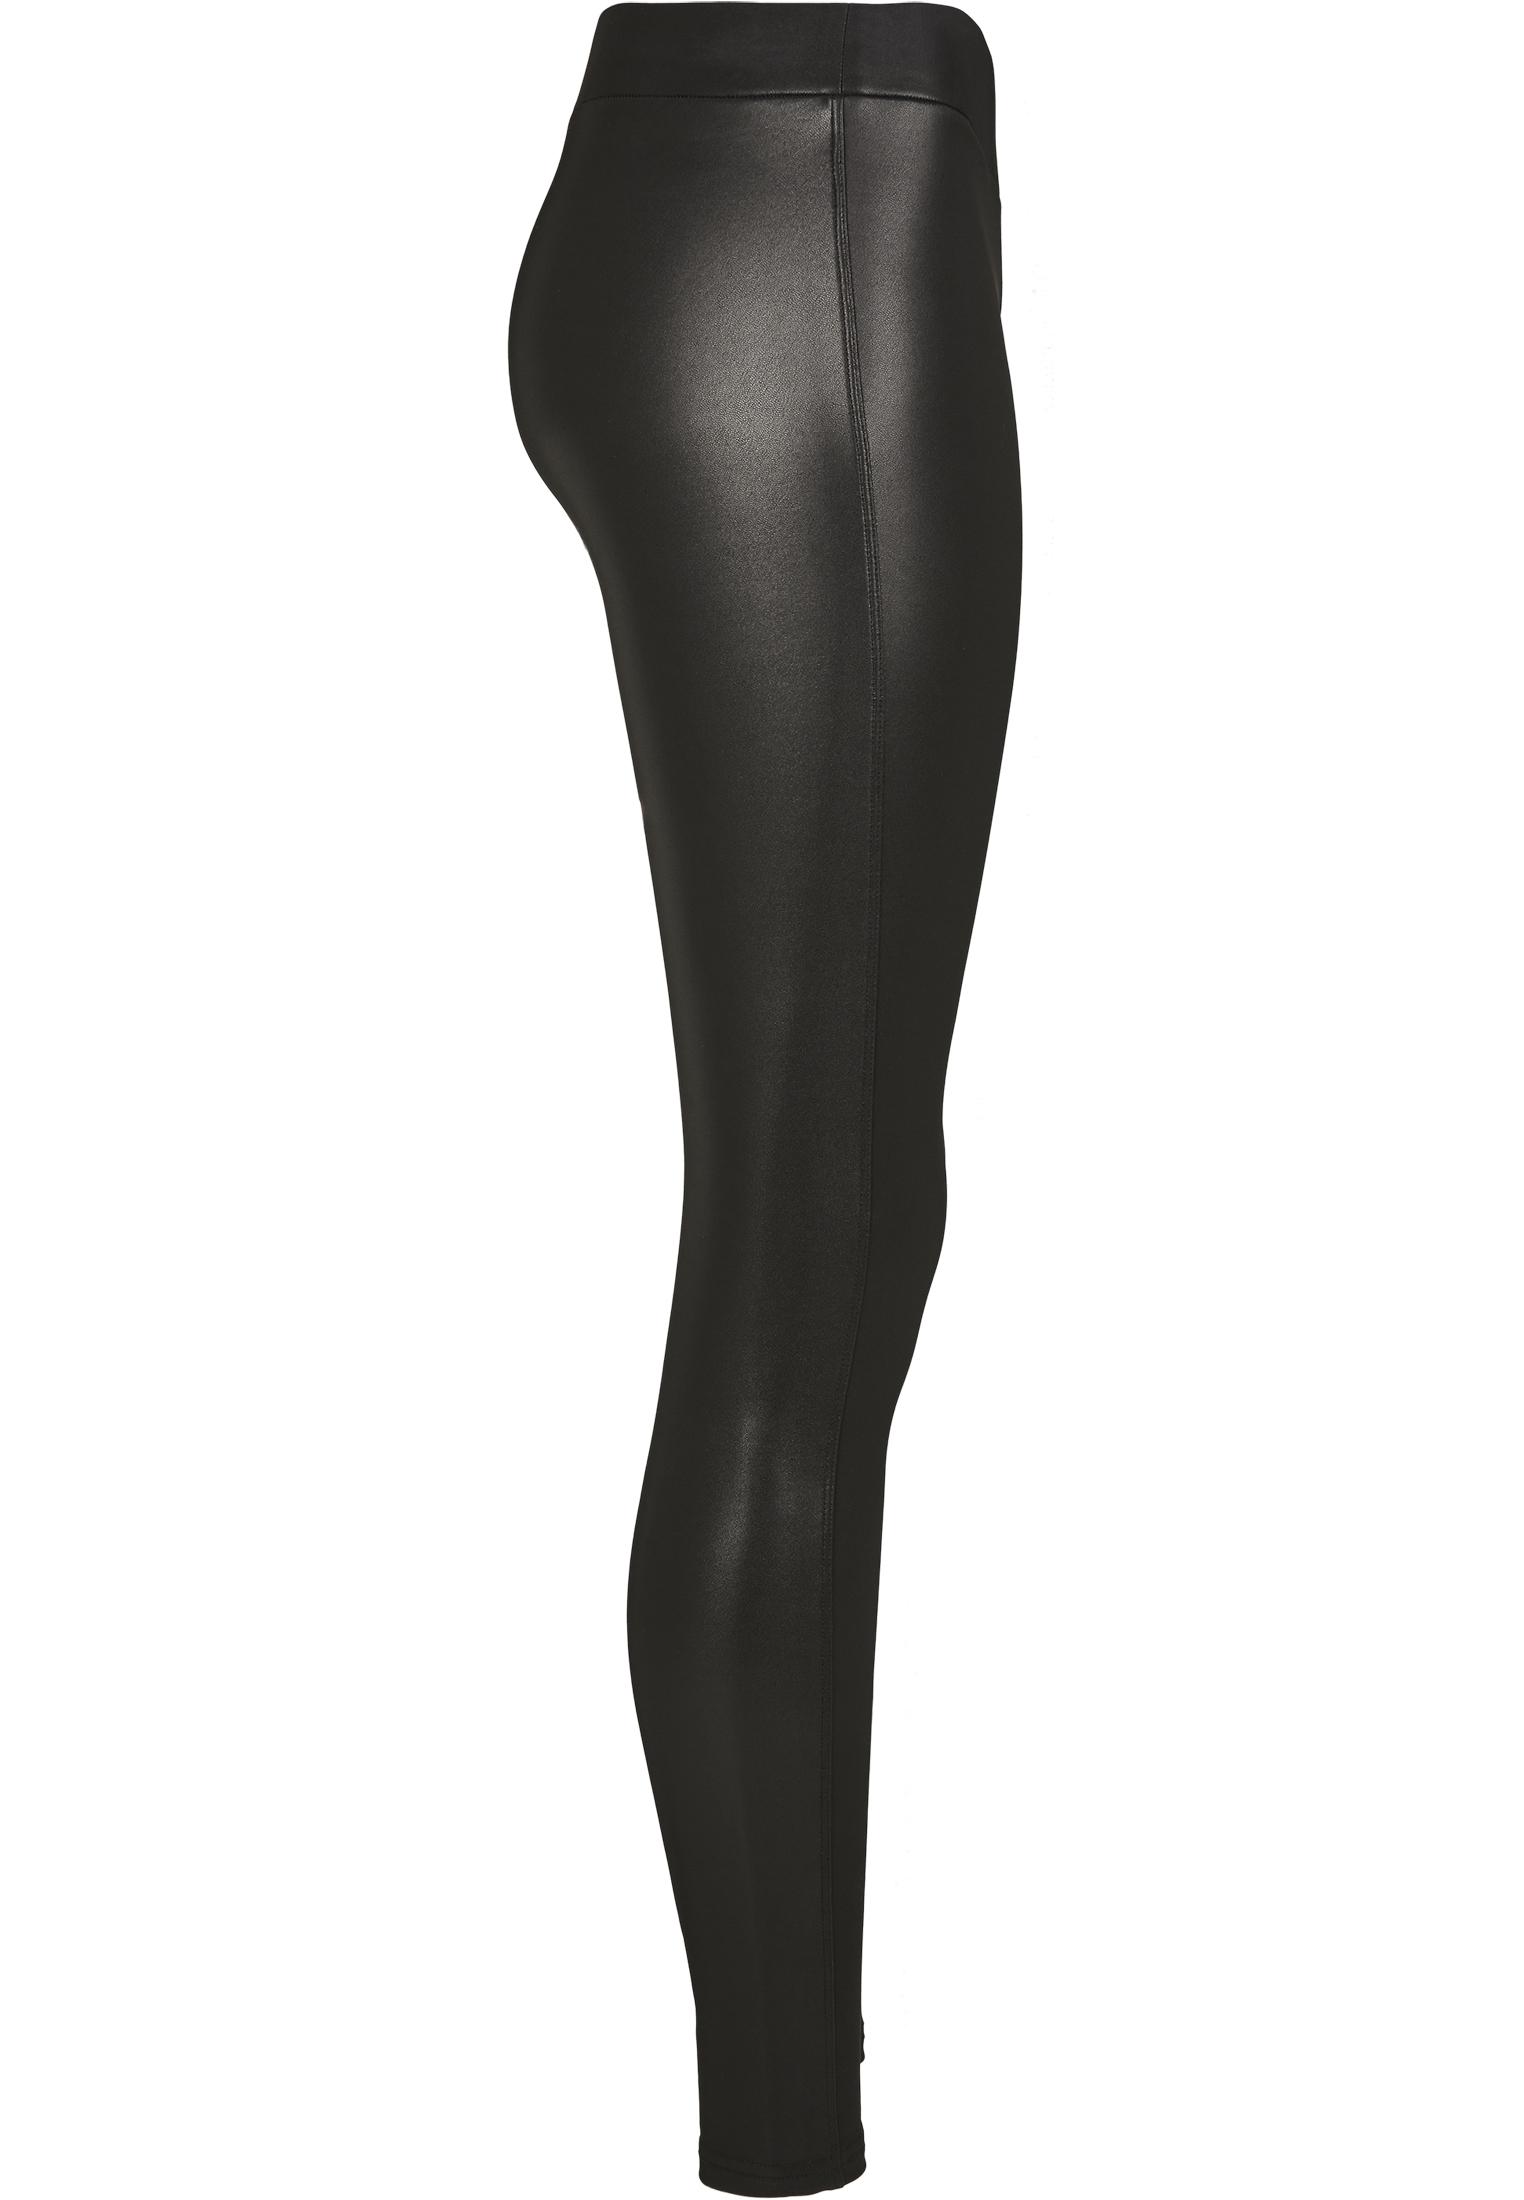 Urban Classics Damen Leggings Sporthose Fitness Ladies Pattern